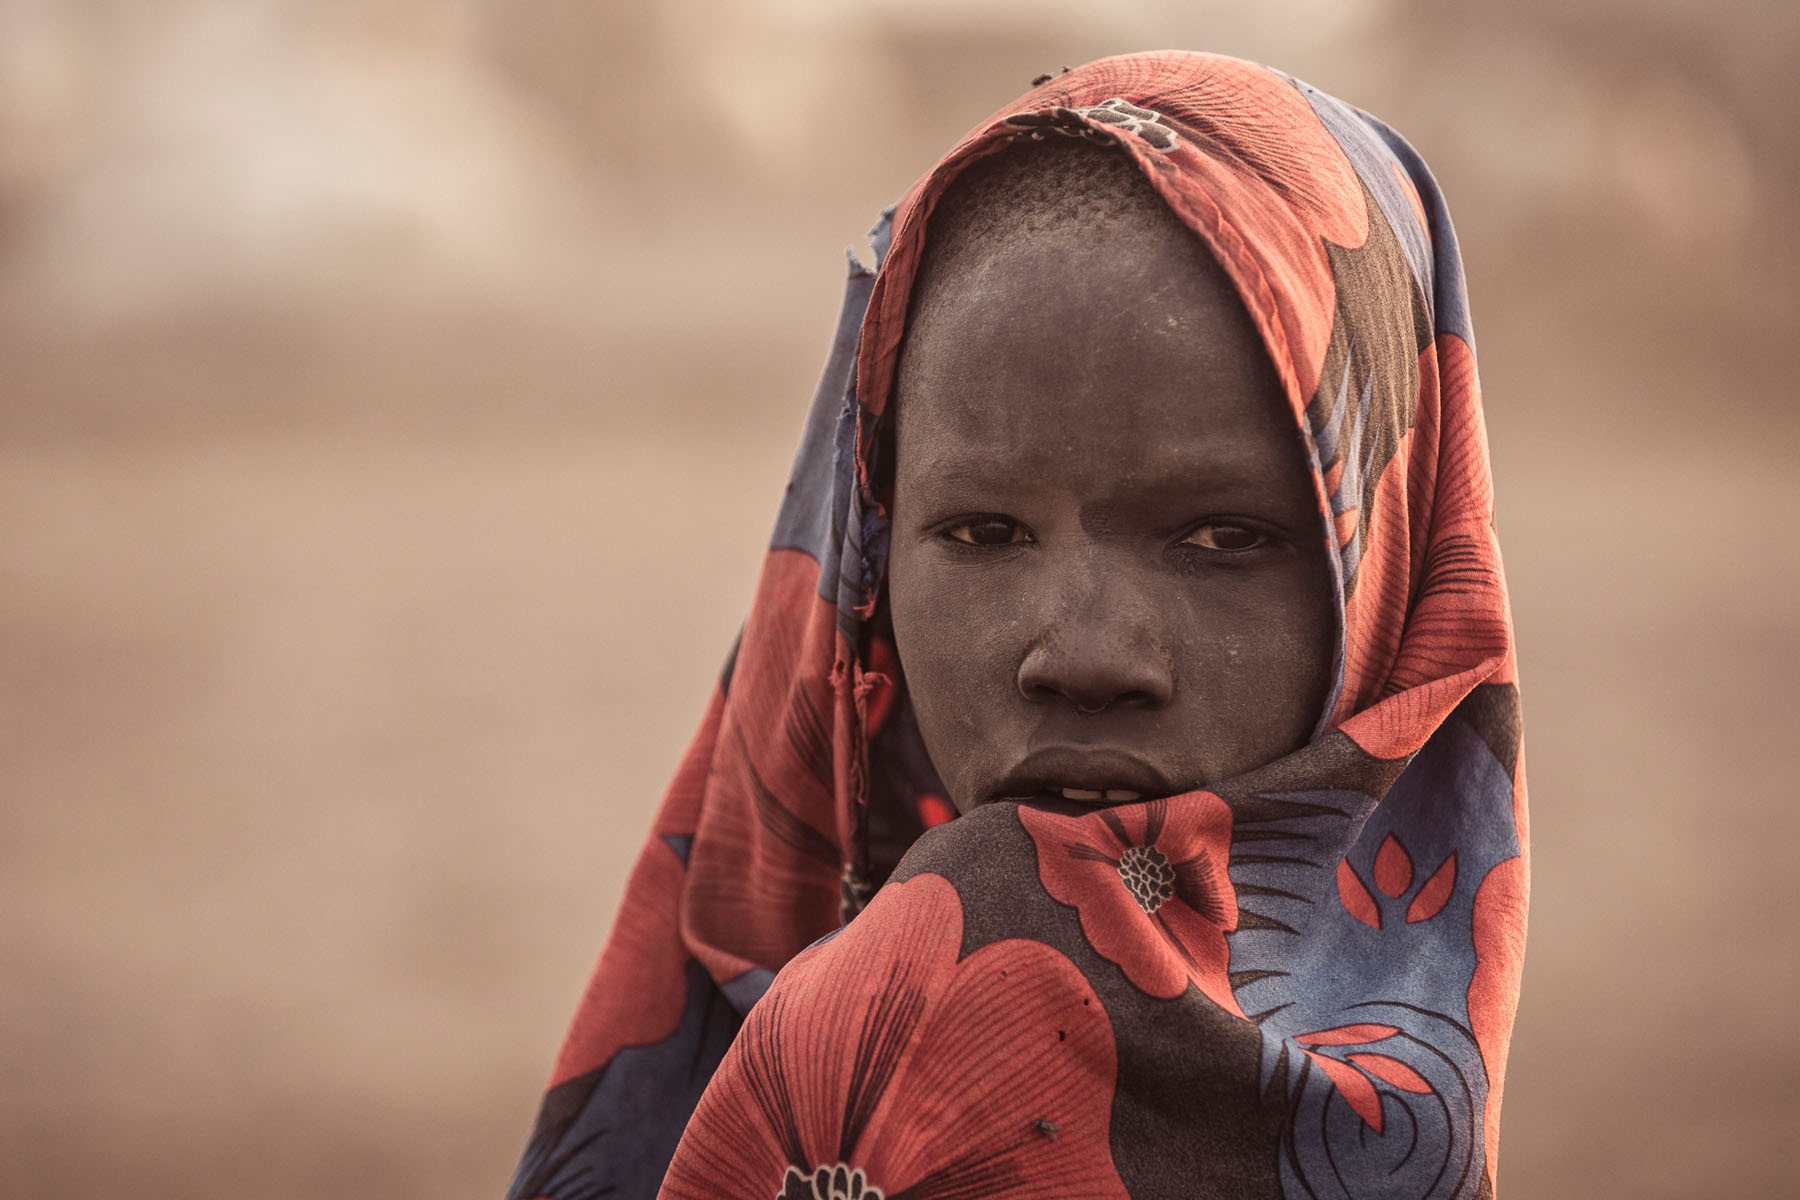 A Mundari boy atsunrise© Joe Buergi